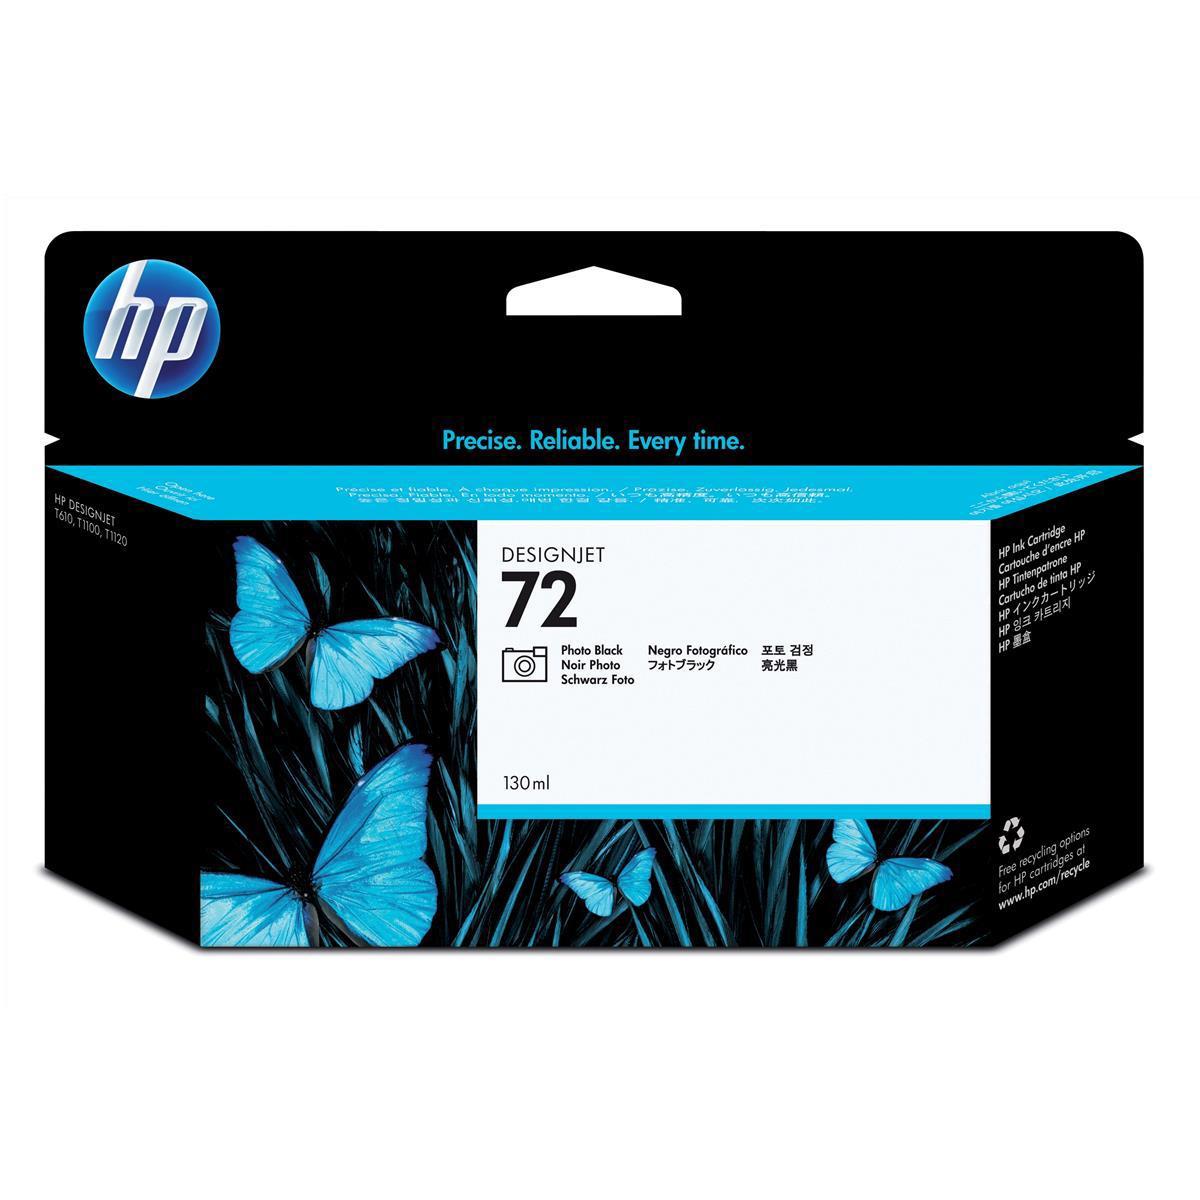 Hewlett Packard [HP] No.72 Inkjet Cartridge High Yield 130ml Photo Black Ref C9370A